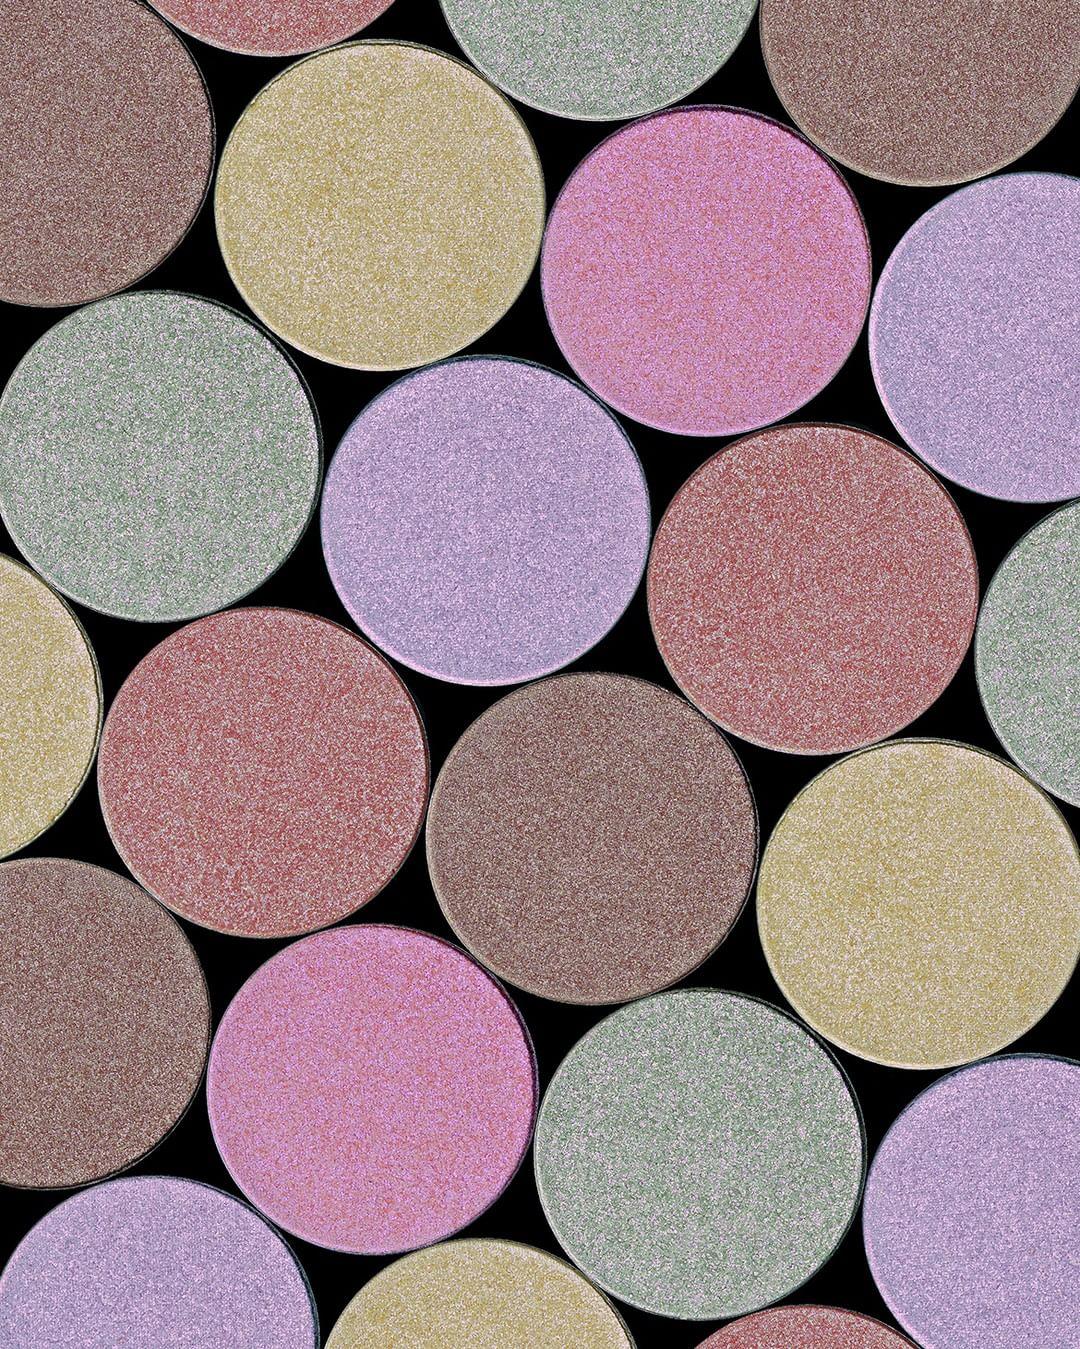 anastasia-beverly-hills-singles-eyeshadow